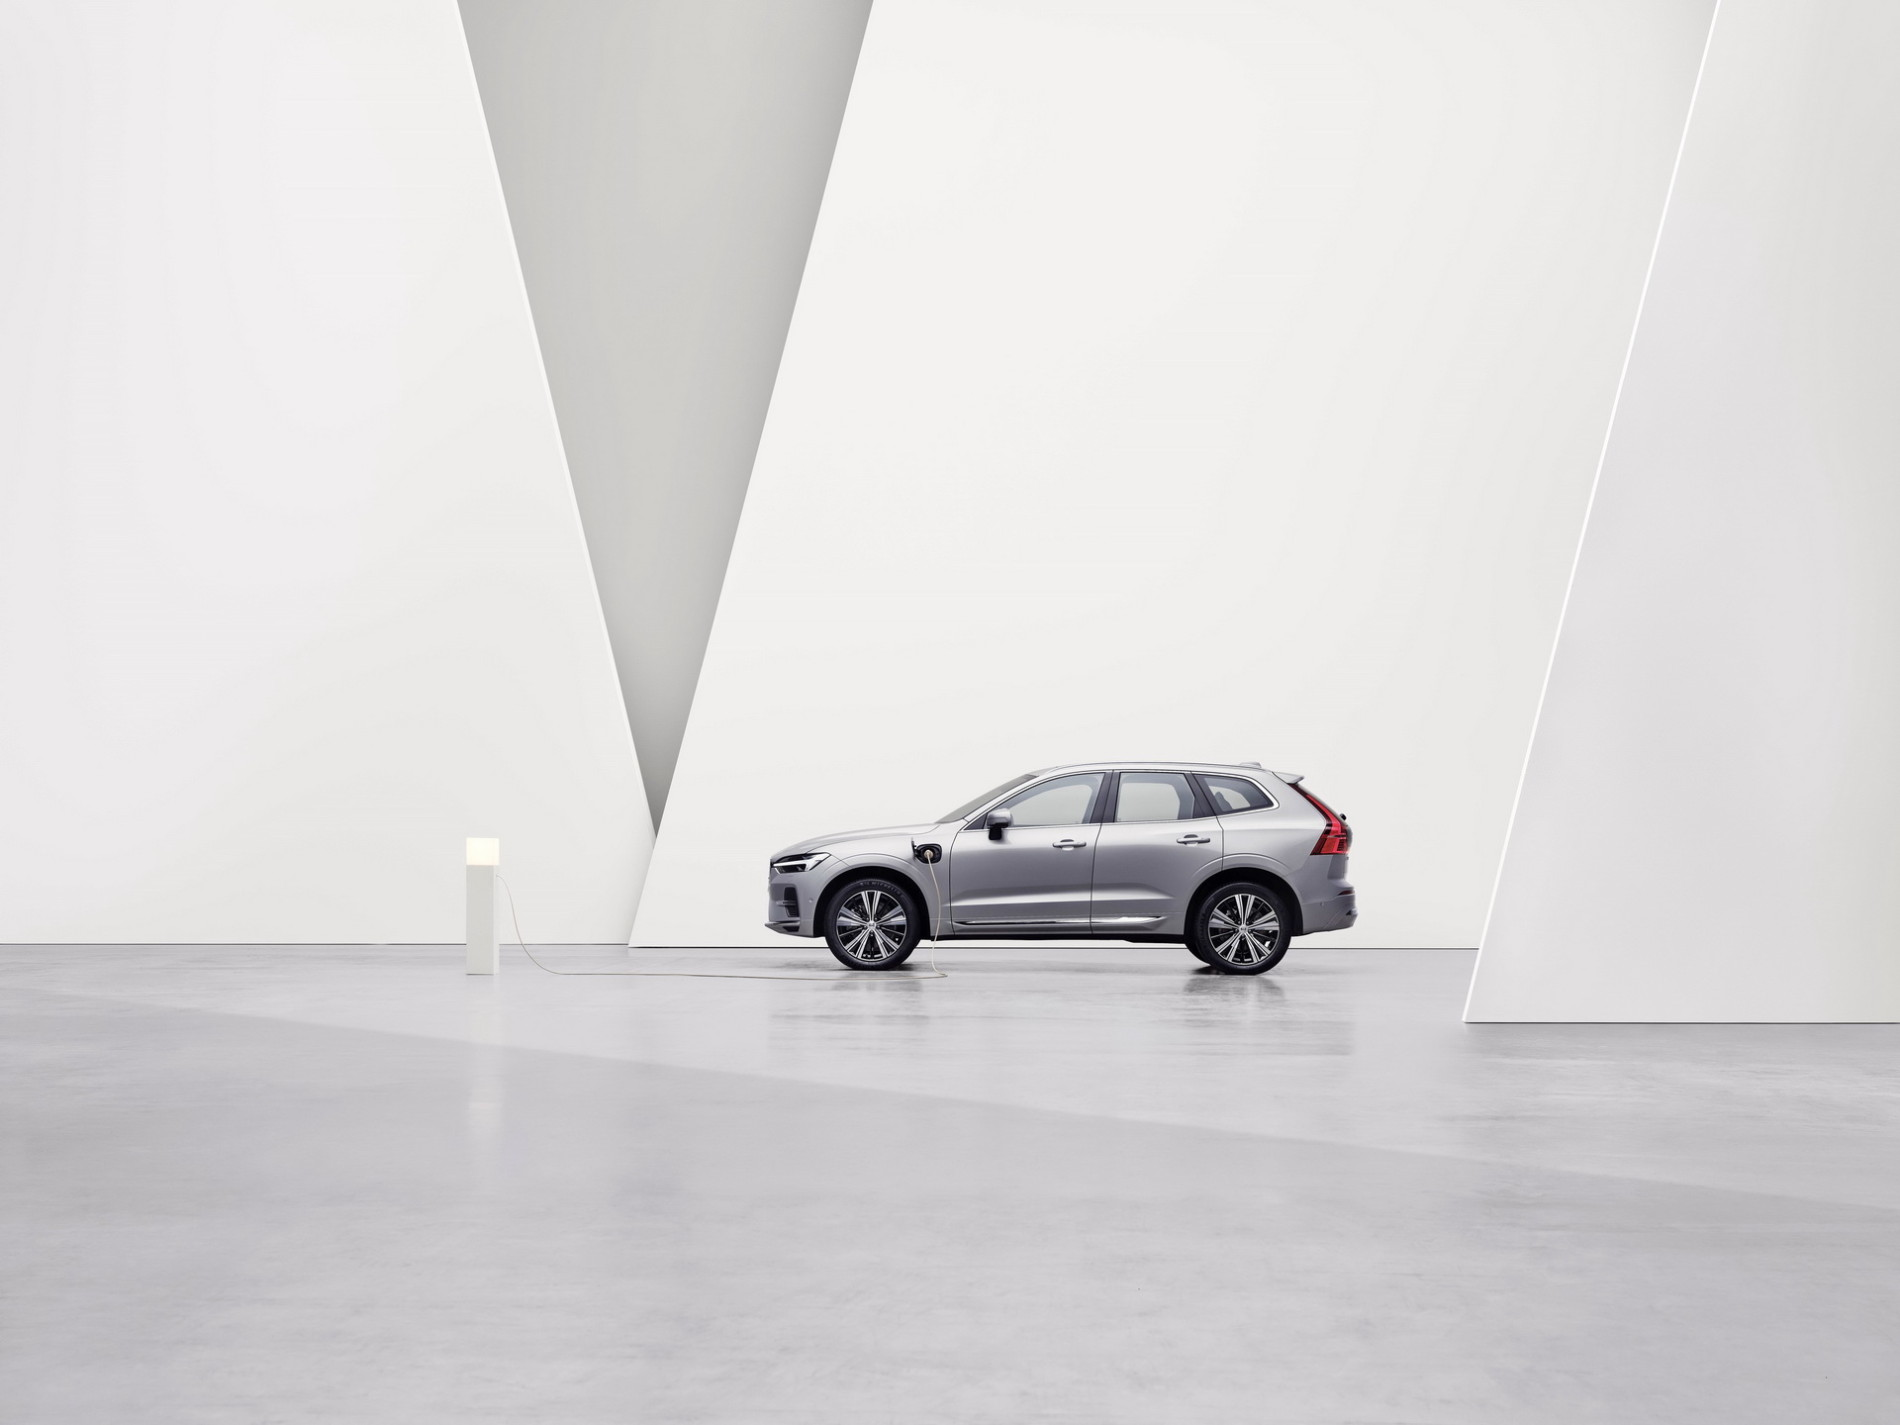 Volvo XC60 Facelift - Volvo XC60 Facelift